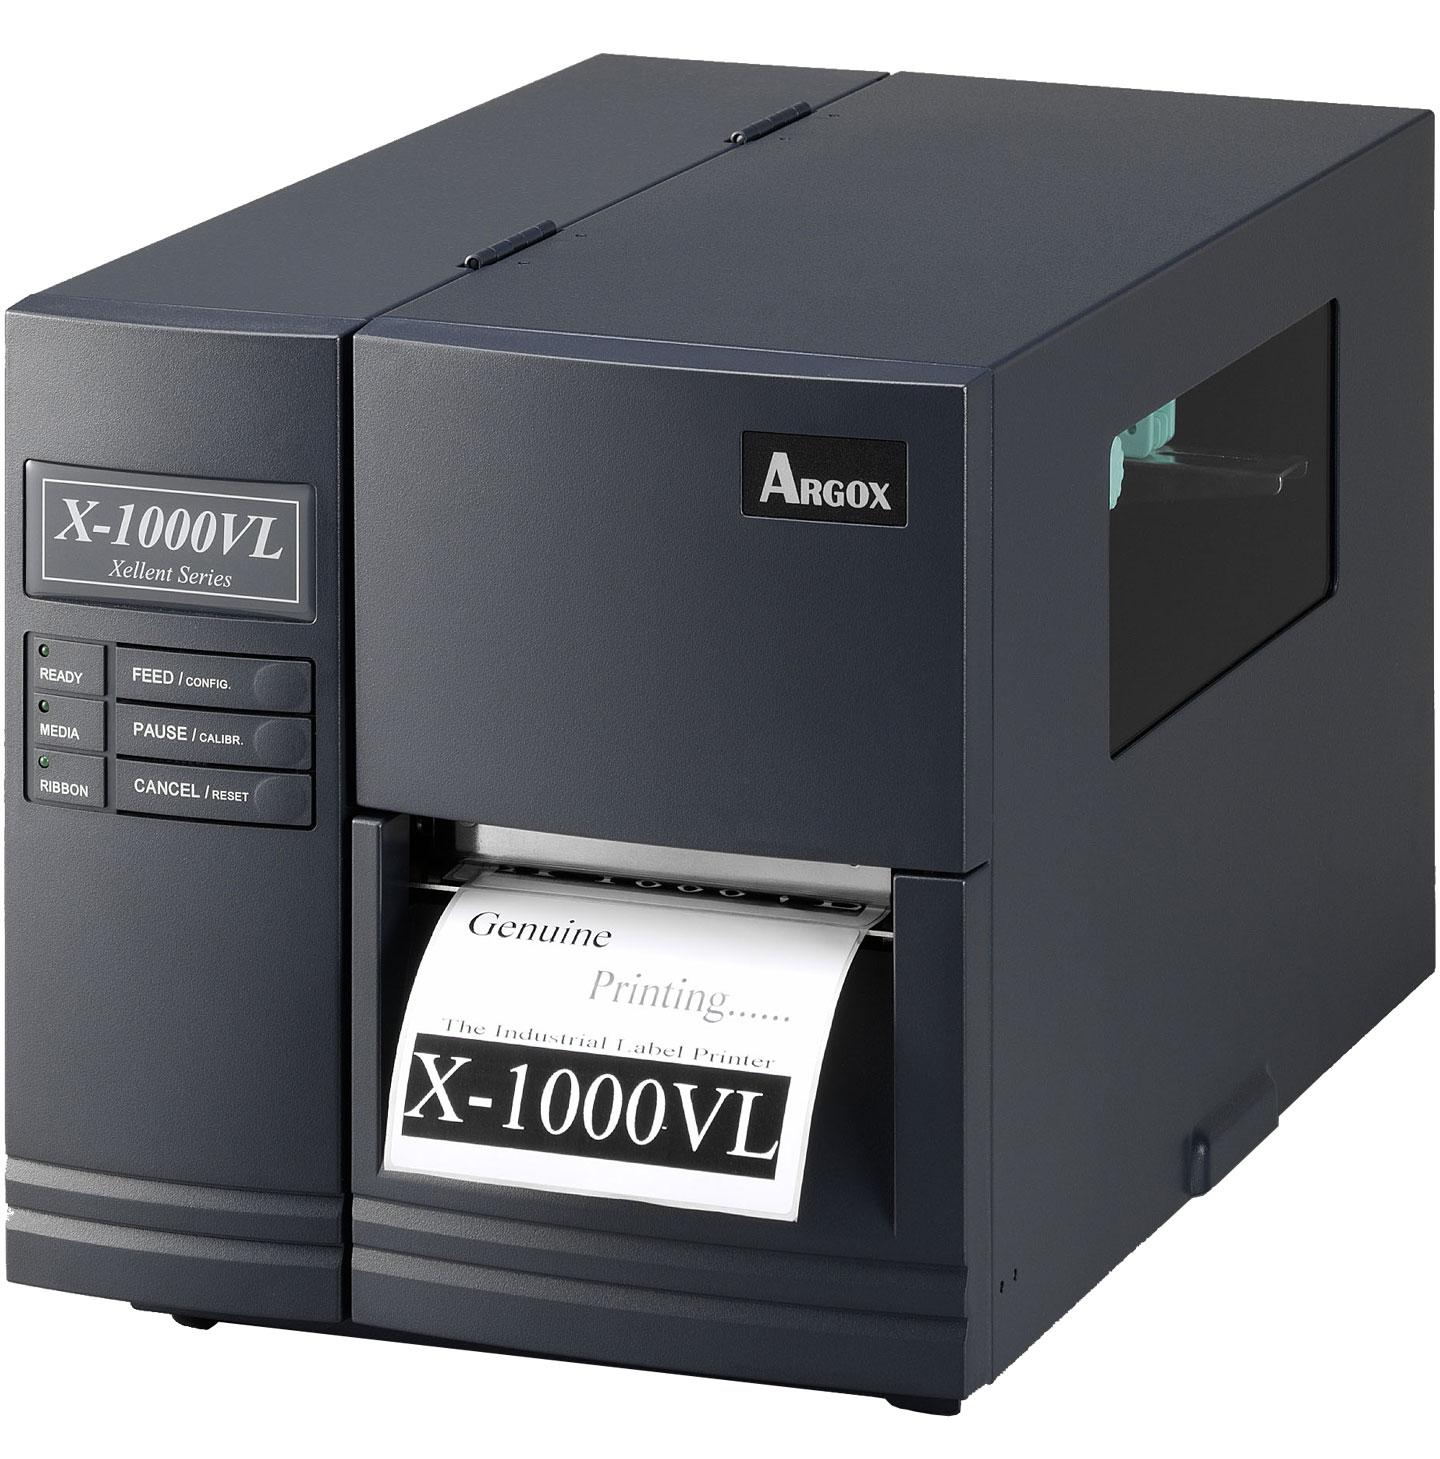 Tsc G210 Pos System Barcode Label Printer Hine